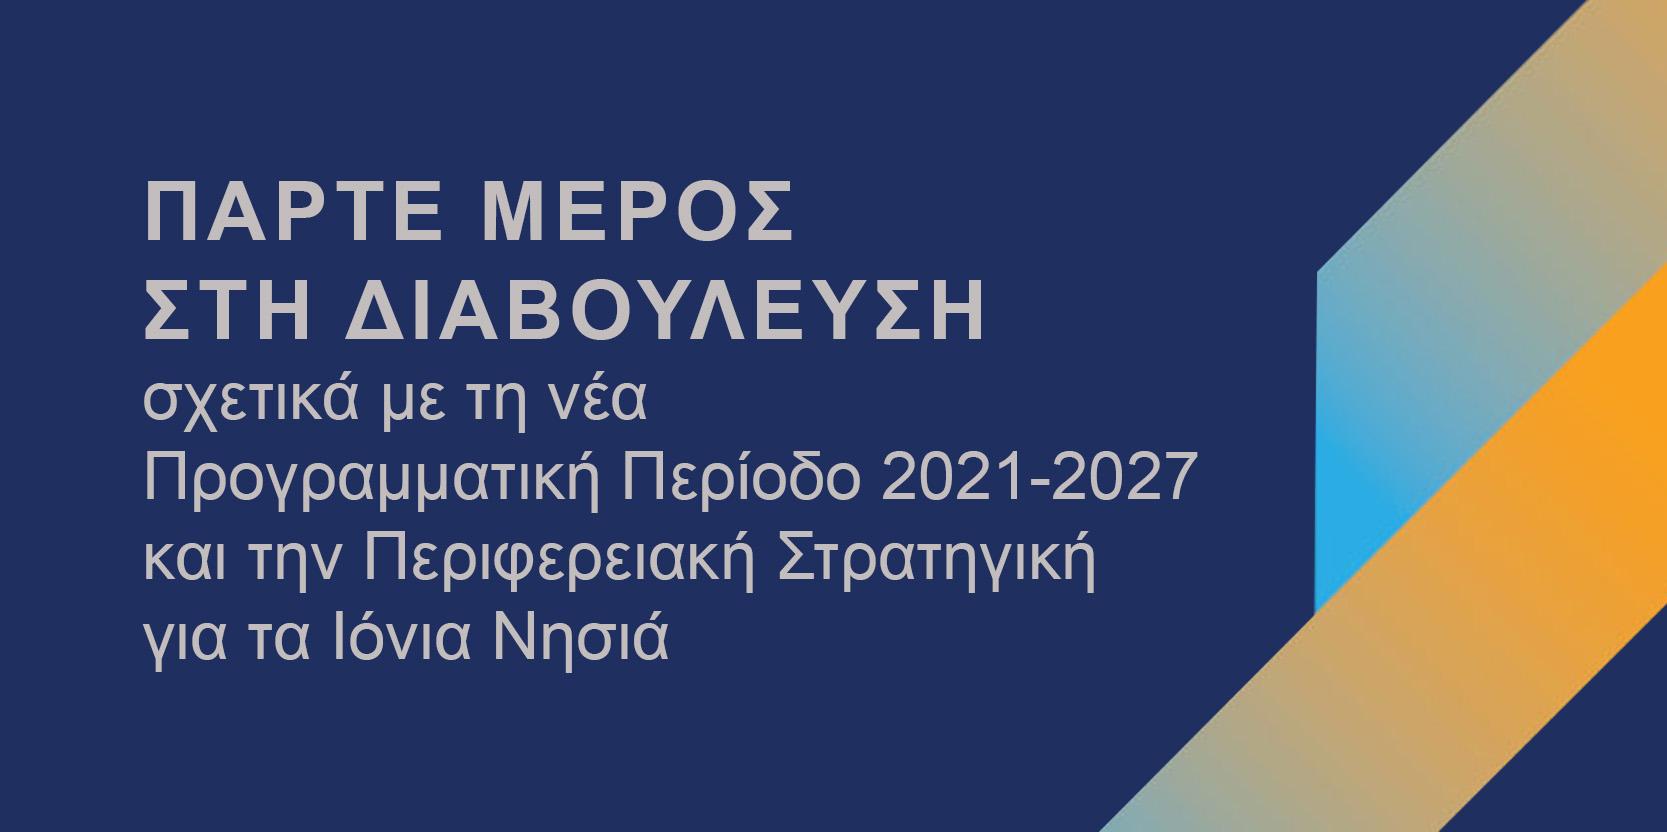 ESPA 2021-2027